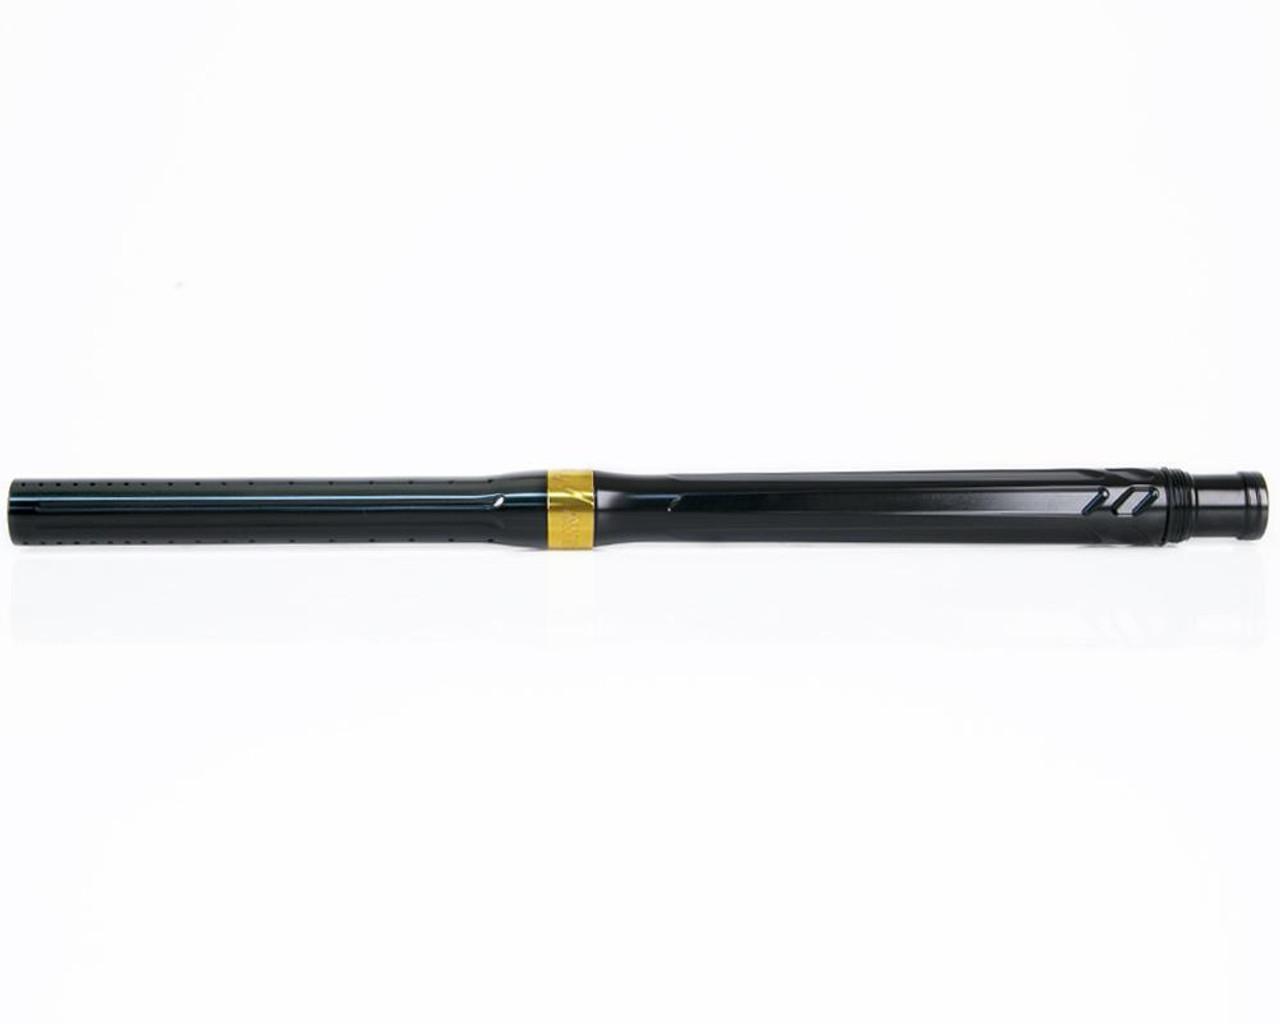 "HK - XV 15"" Barrel Kit w/Case - Polish Black - Luxe"